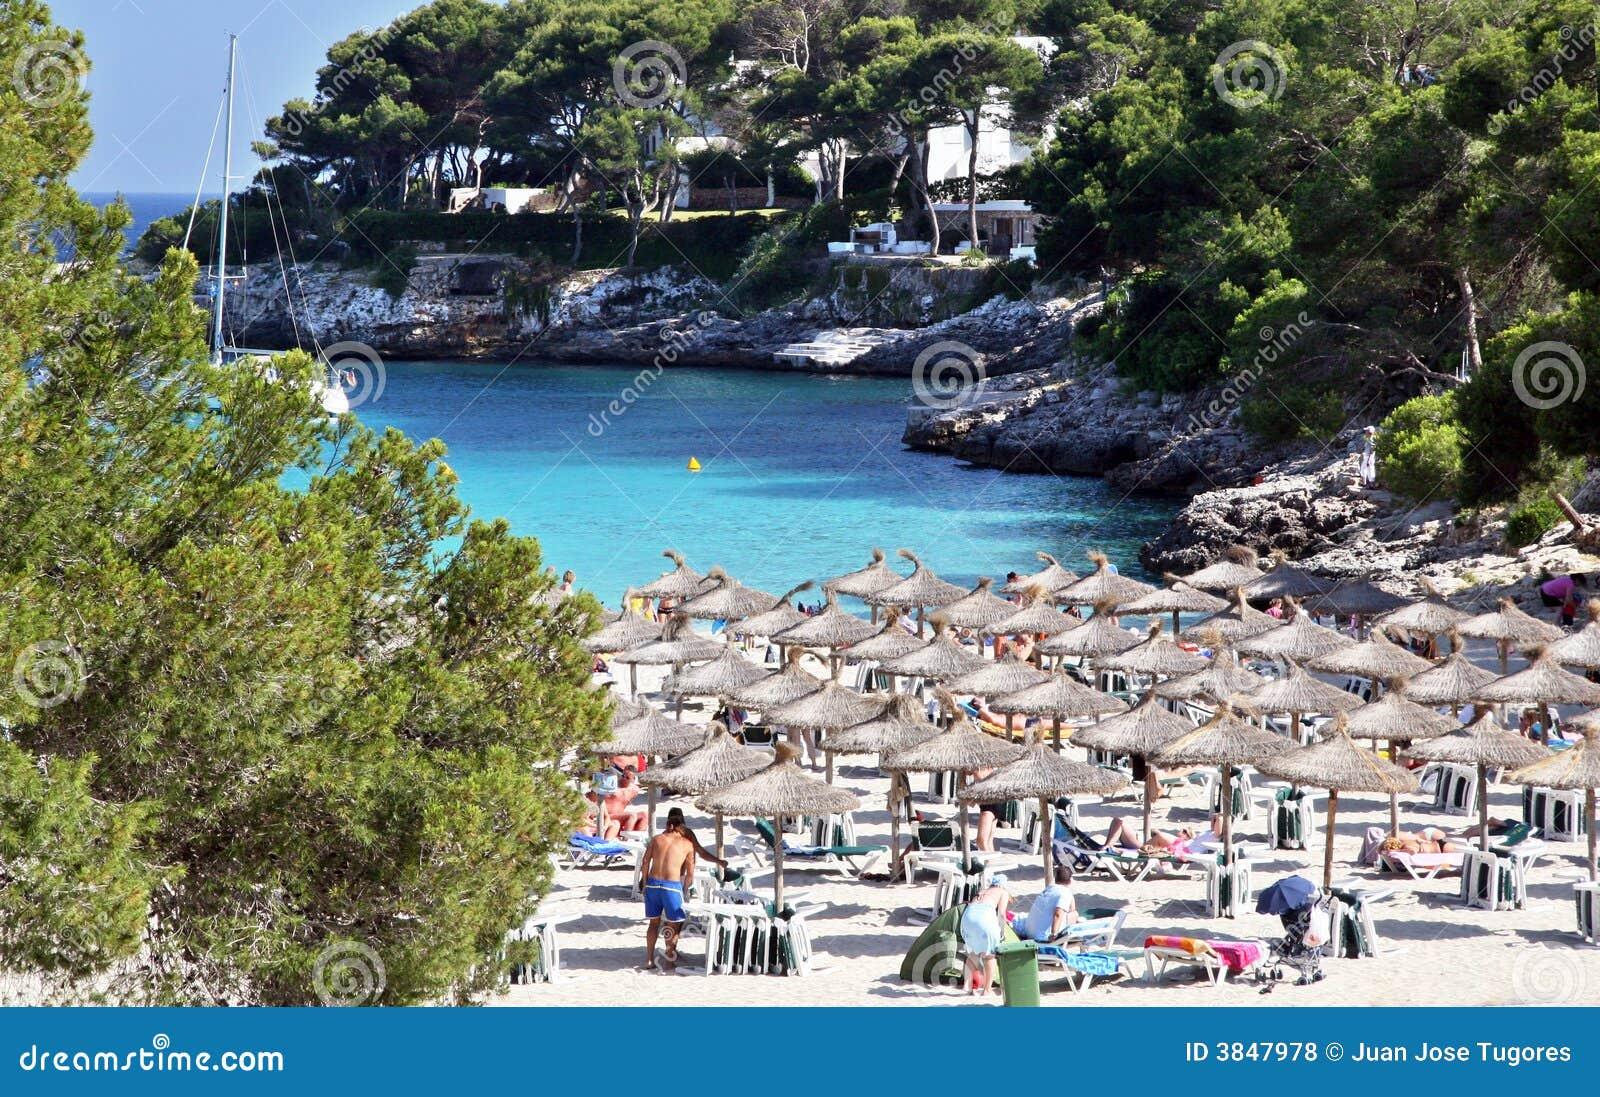 Spanish resort at Cala Dor